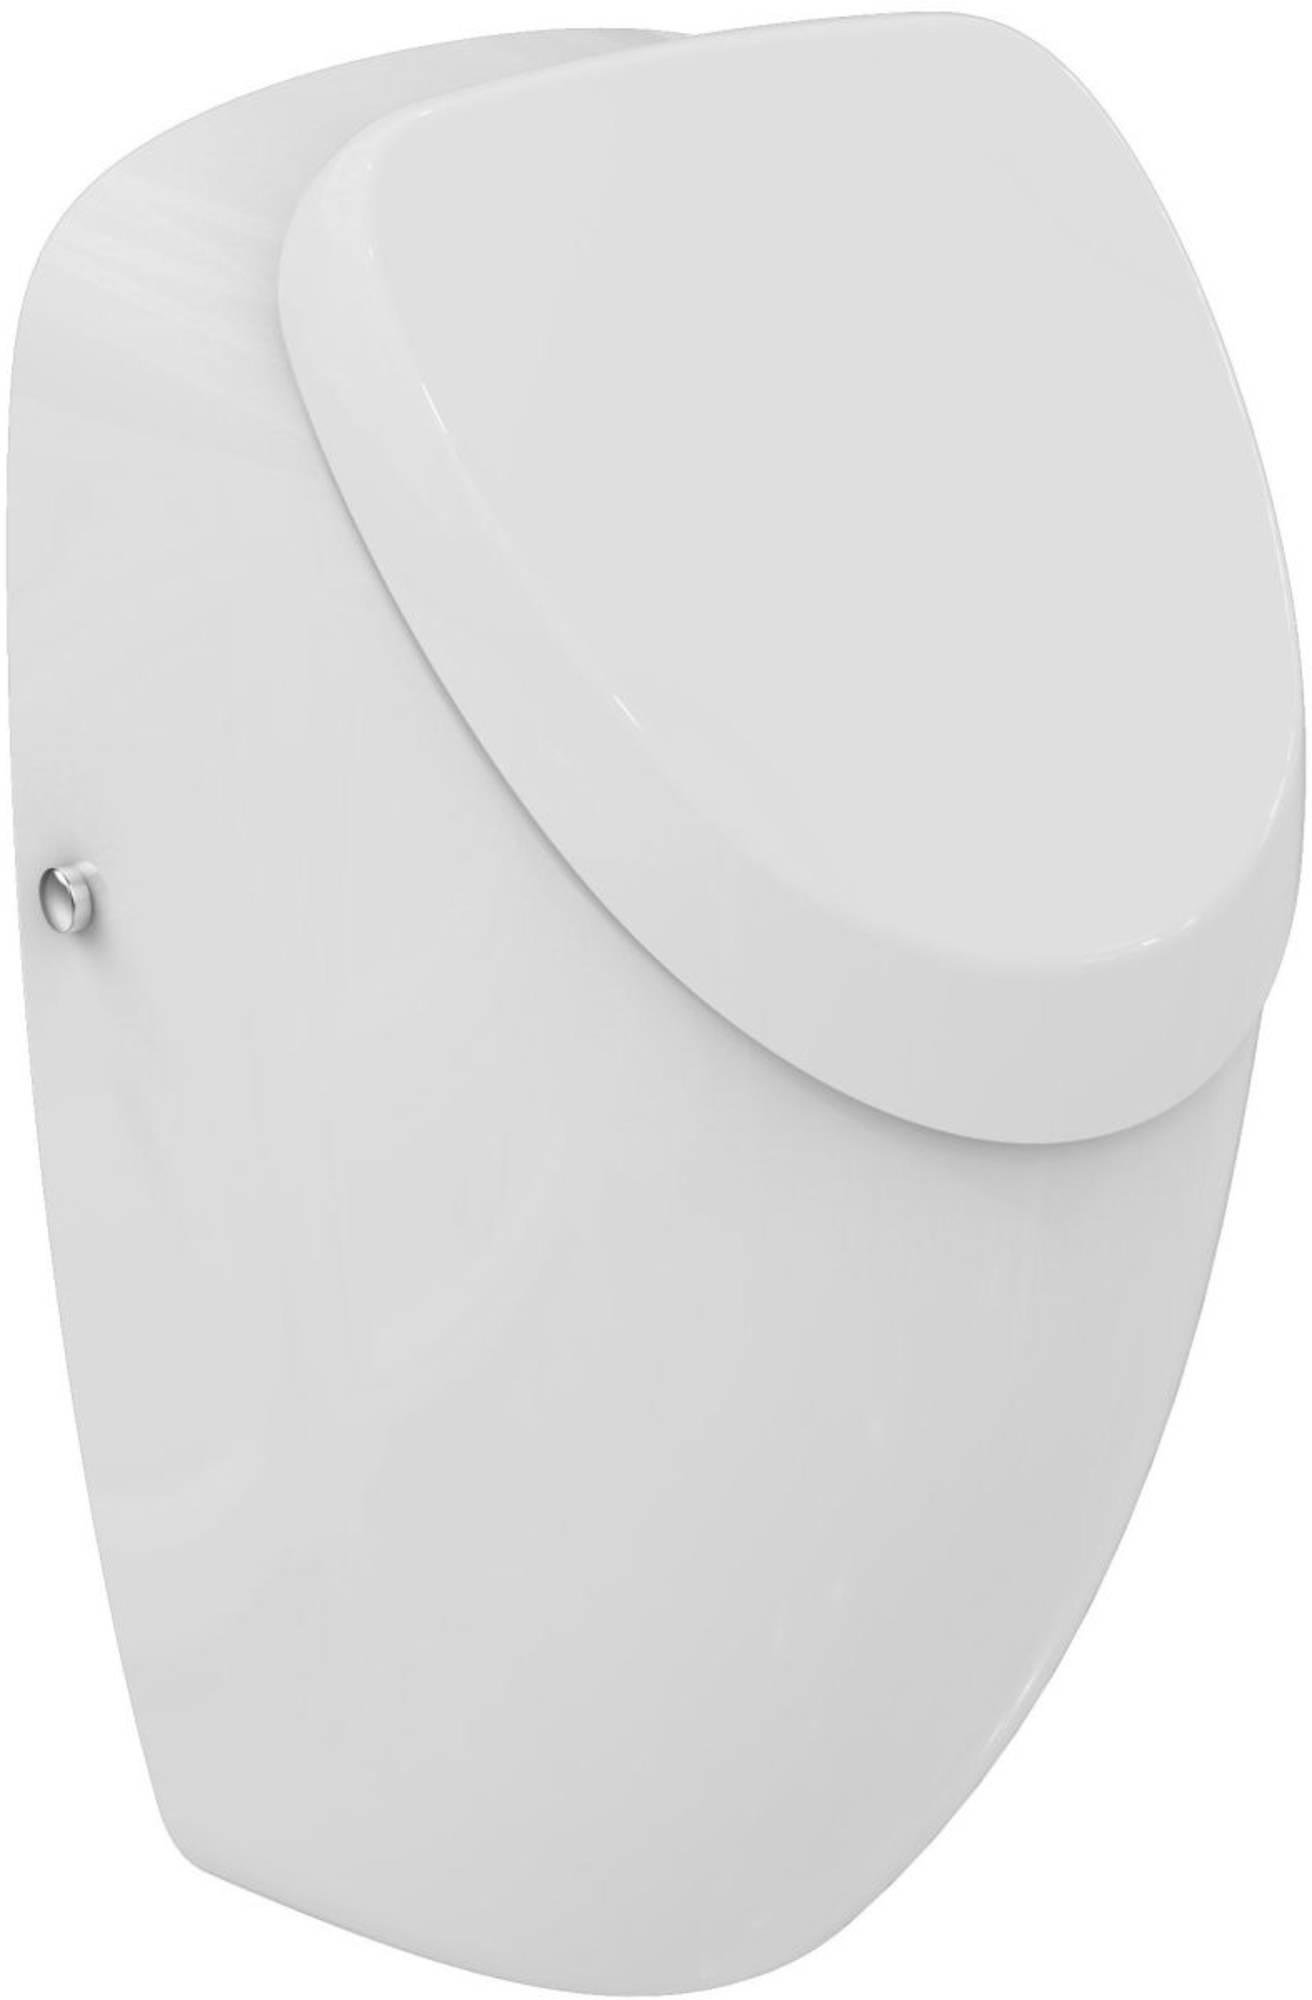 Ideal Standard Connect urinoir voor deksel ideal plus Wit